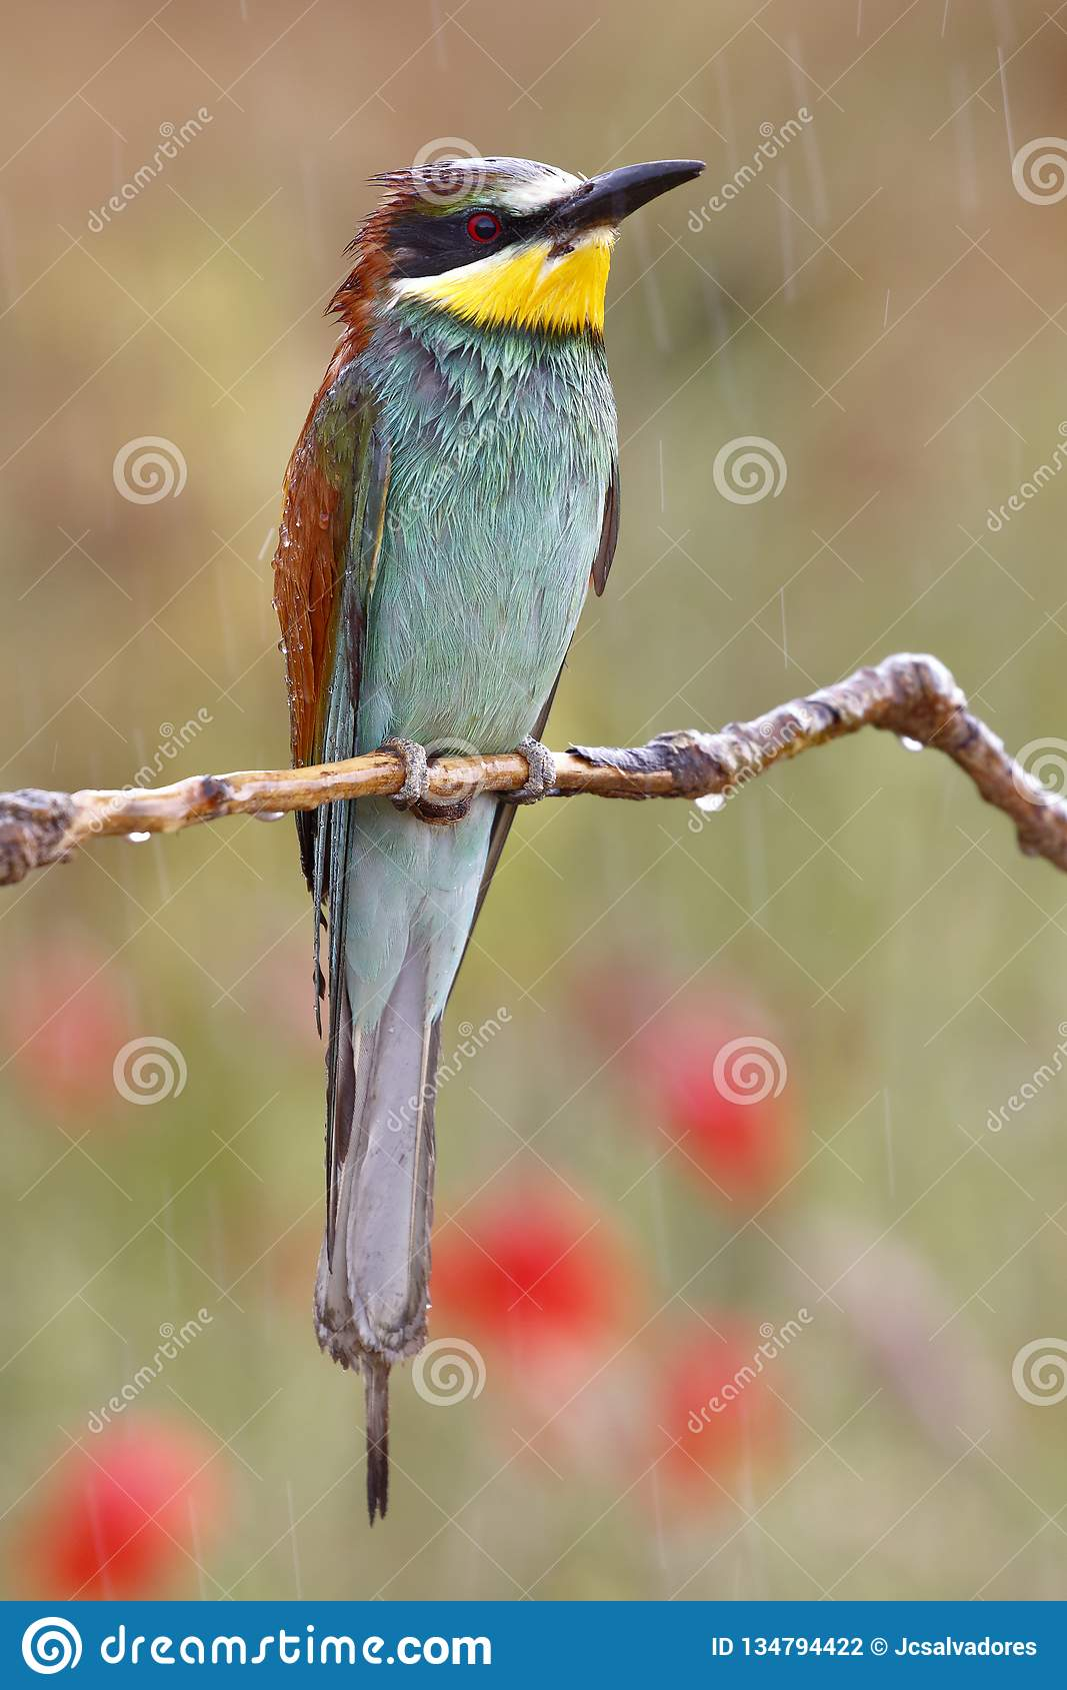 Europese bij-eter, Merops apiaster, mooie gekleurde vogel